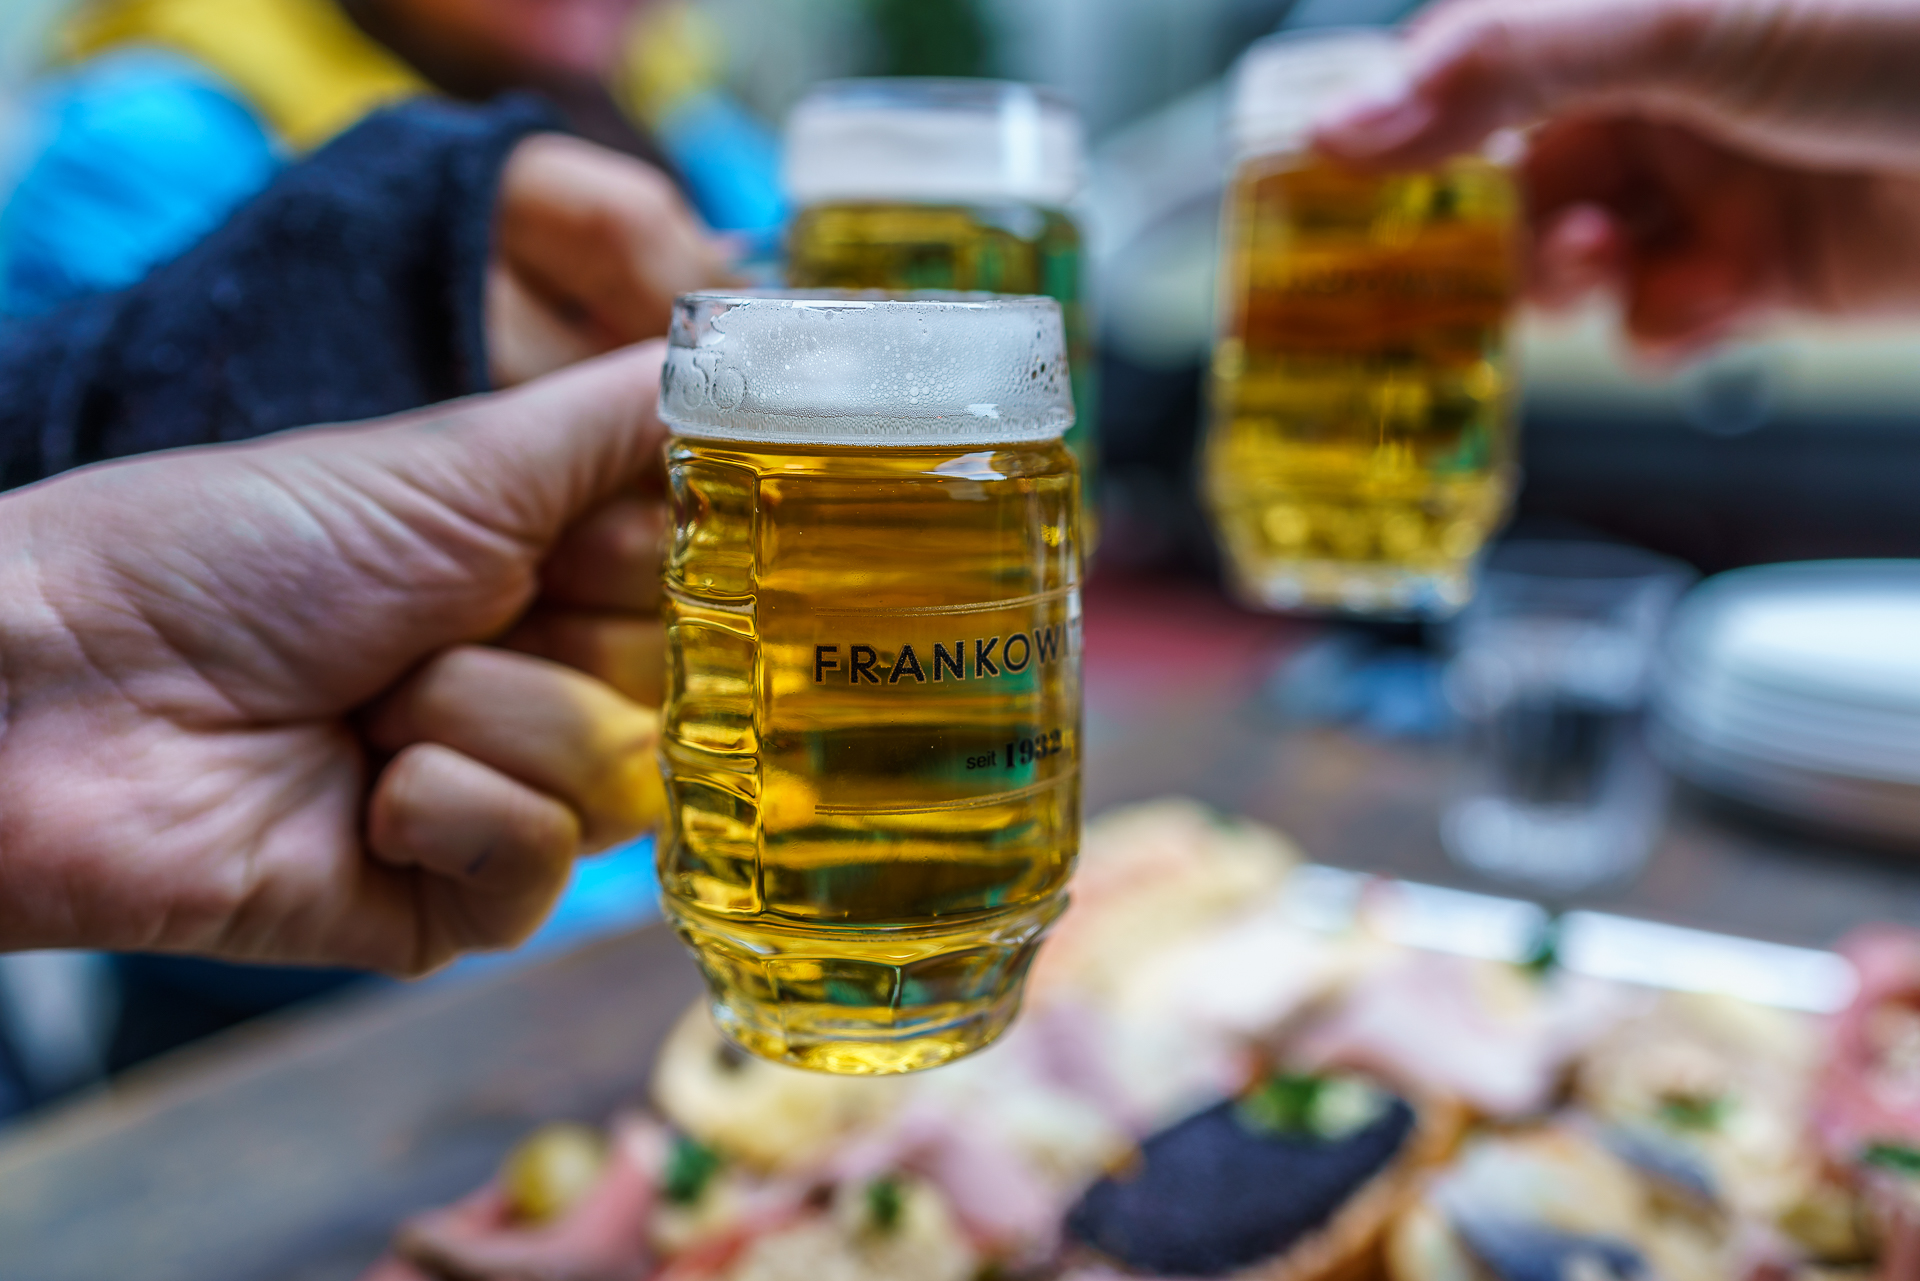 Pfiff-Fruehstuecksbier-Frankowitsch